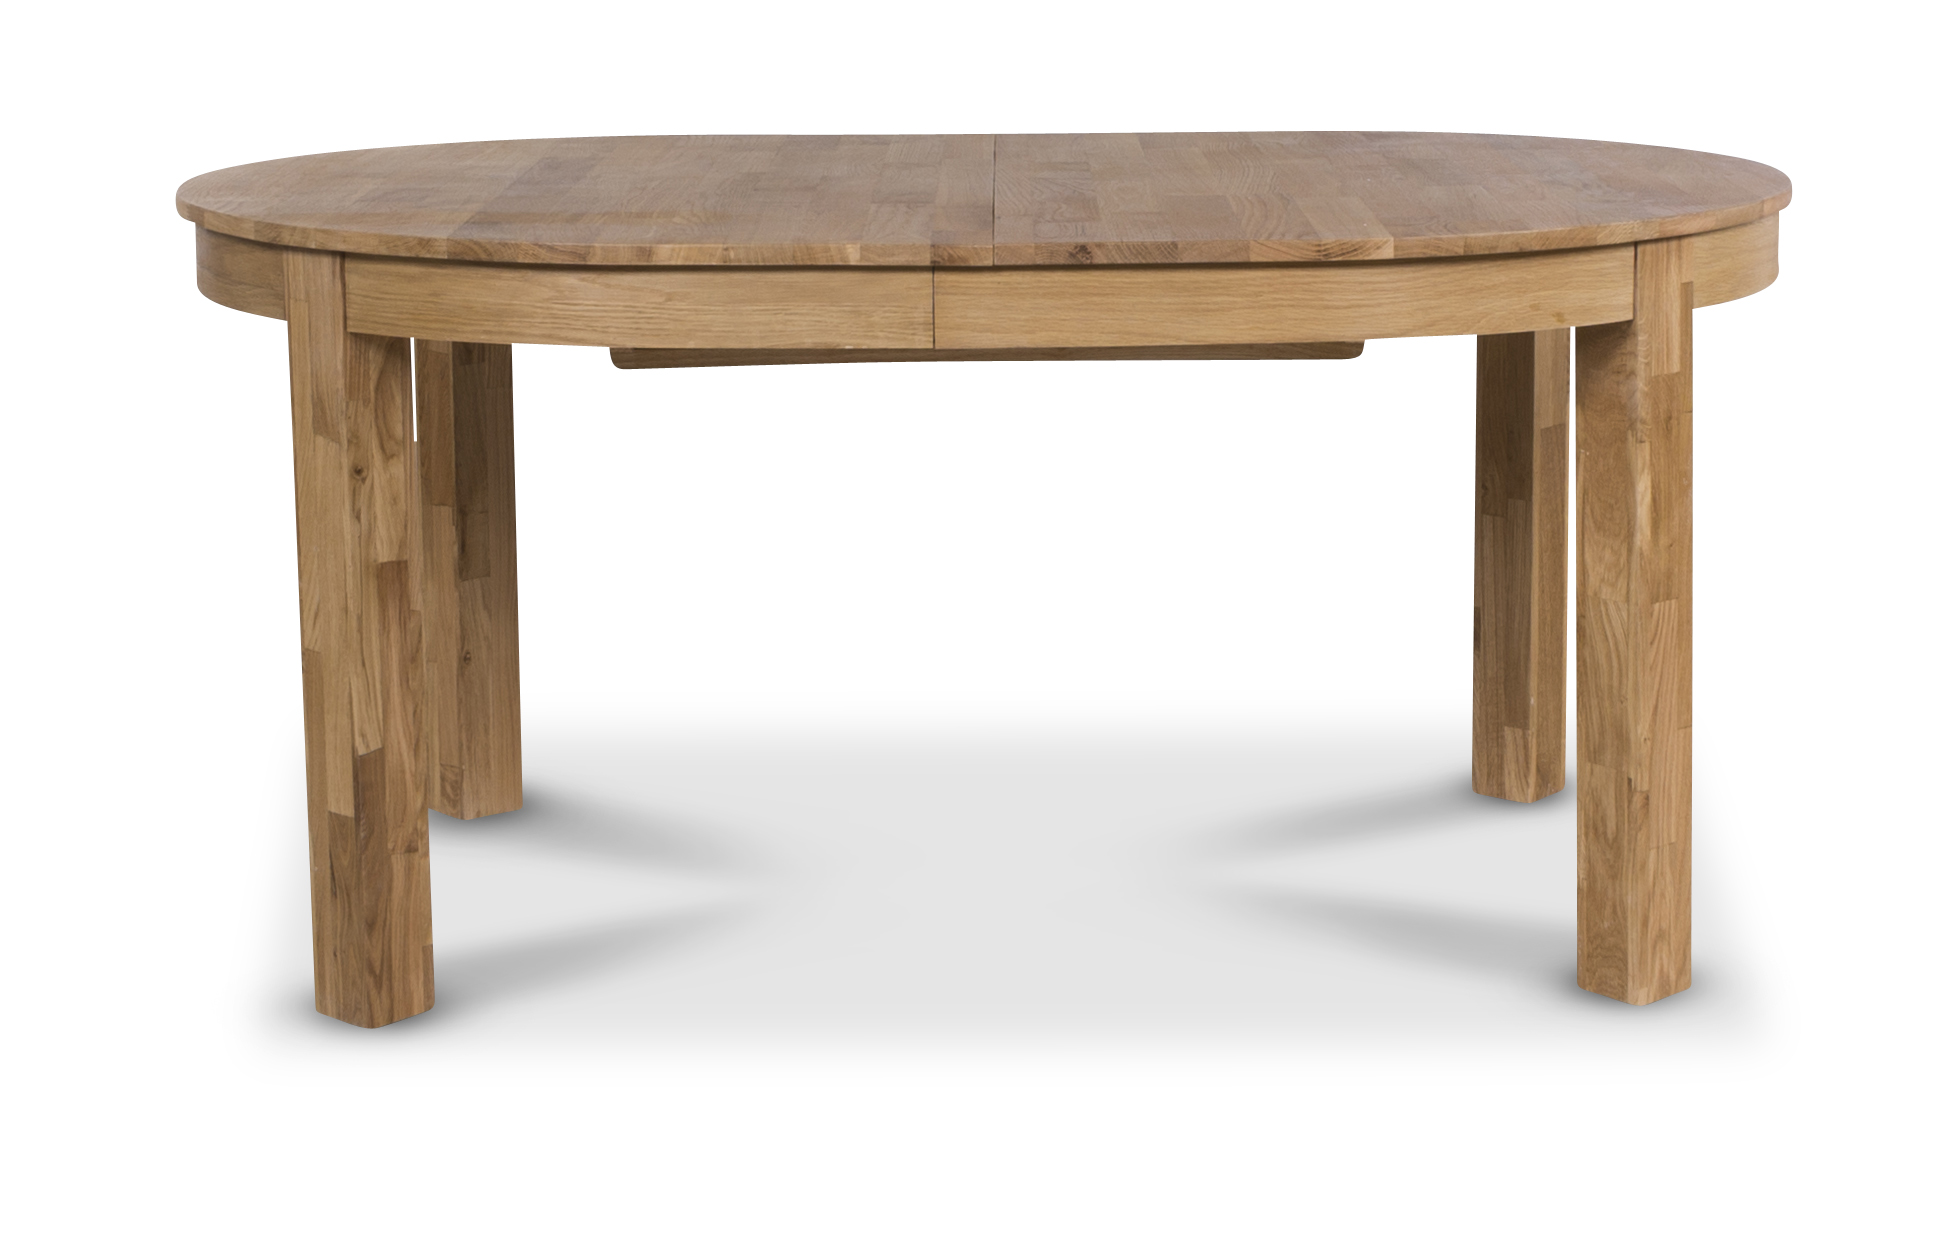 Dalarö ovalt matbord 160 205 cm Oljad ek 5490 kr